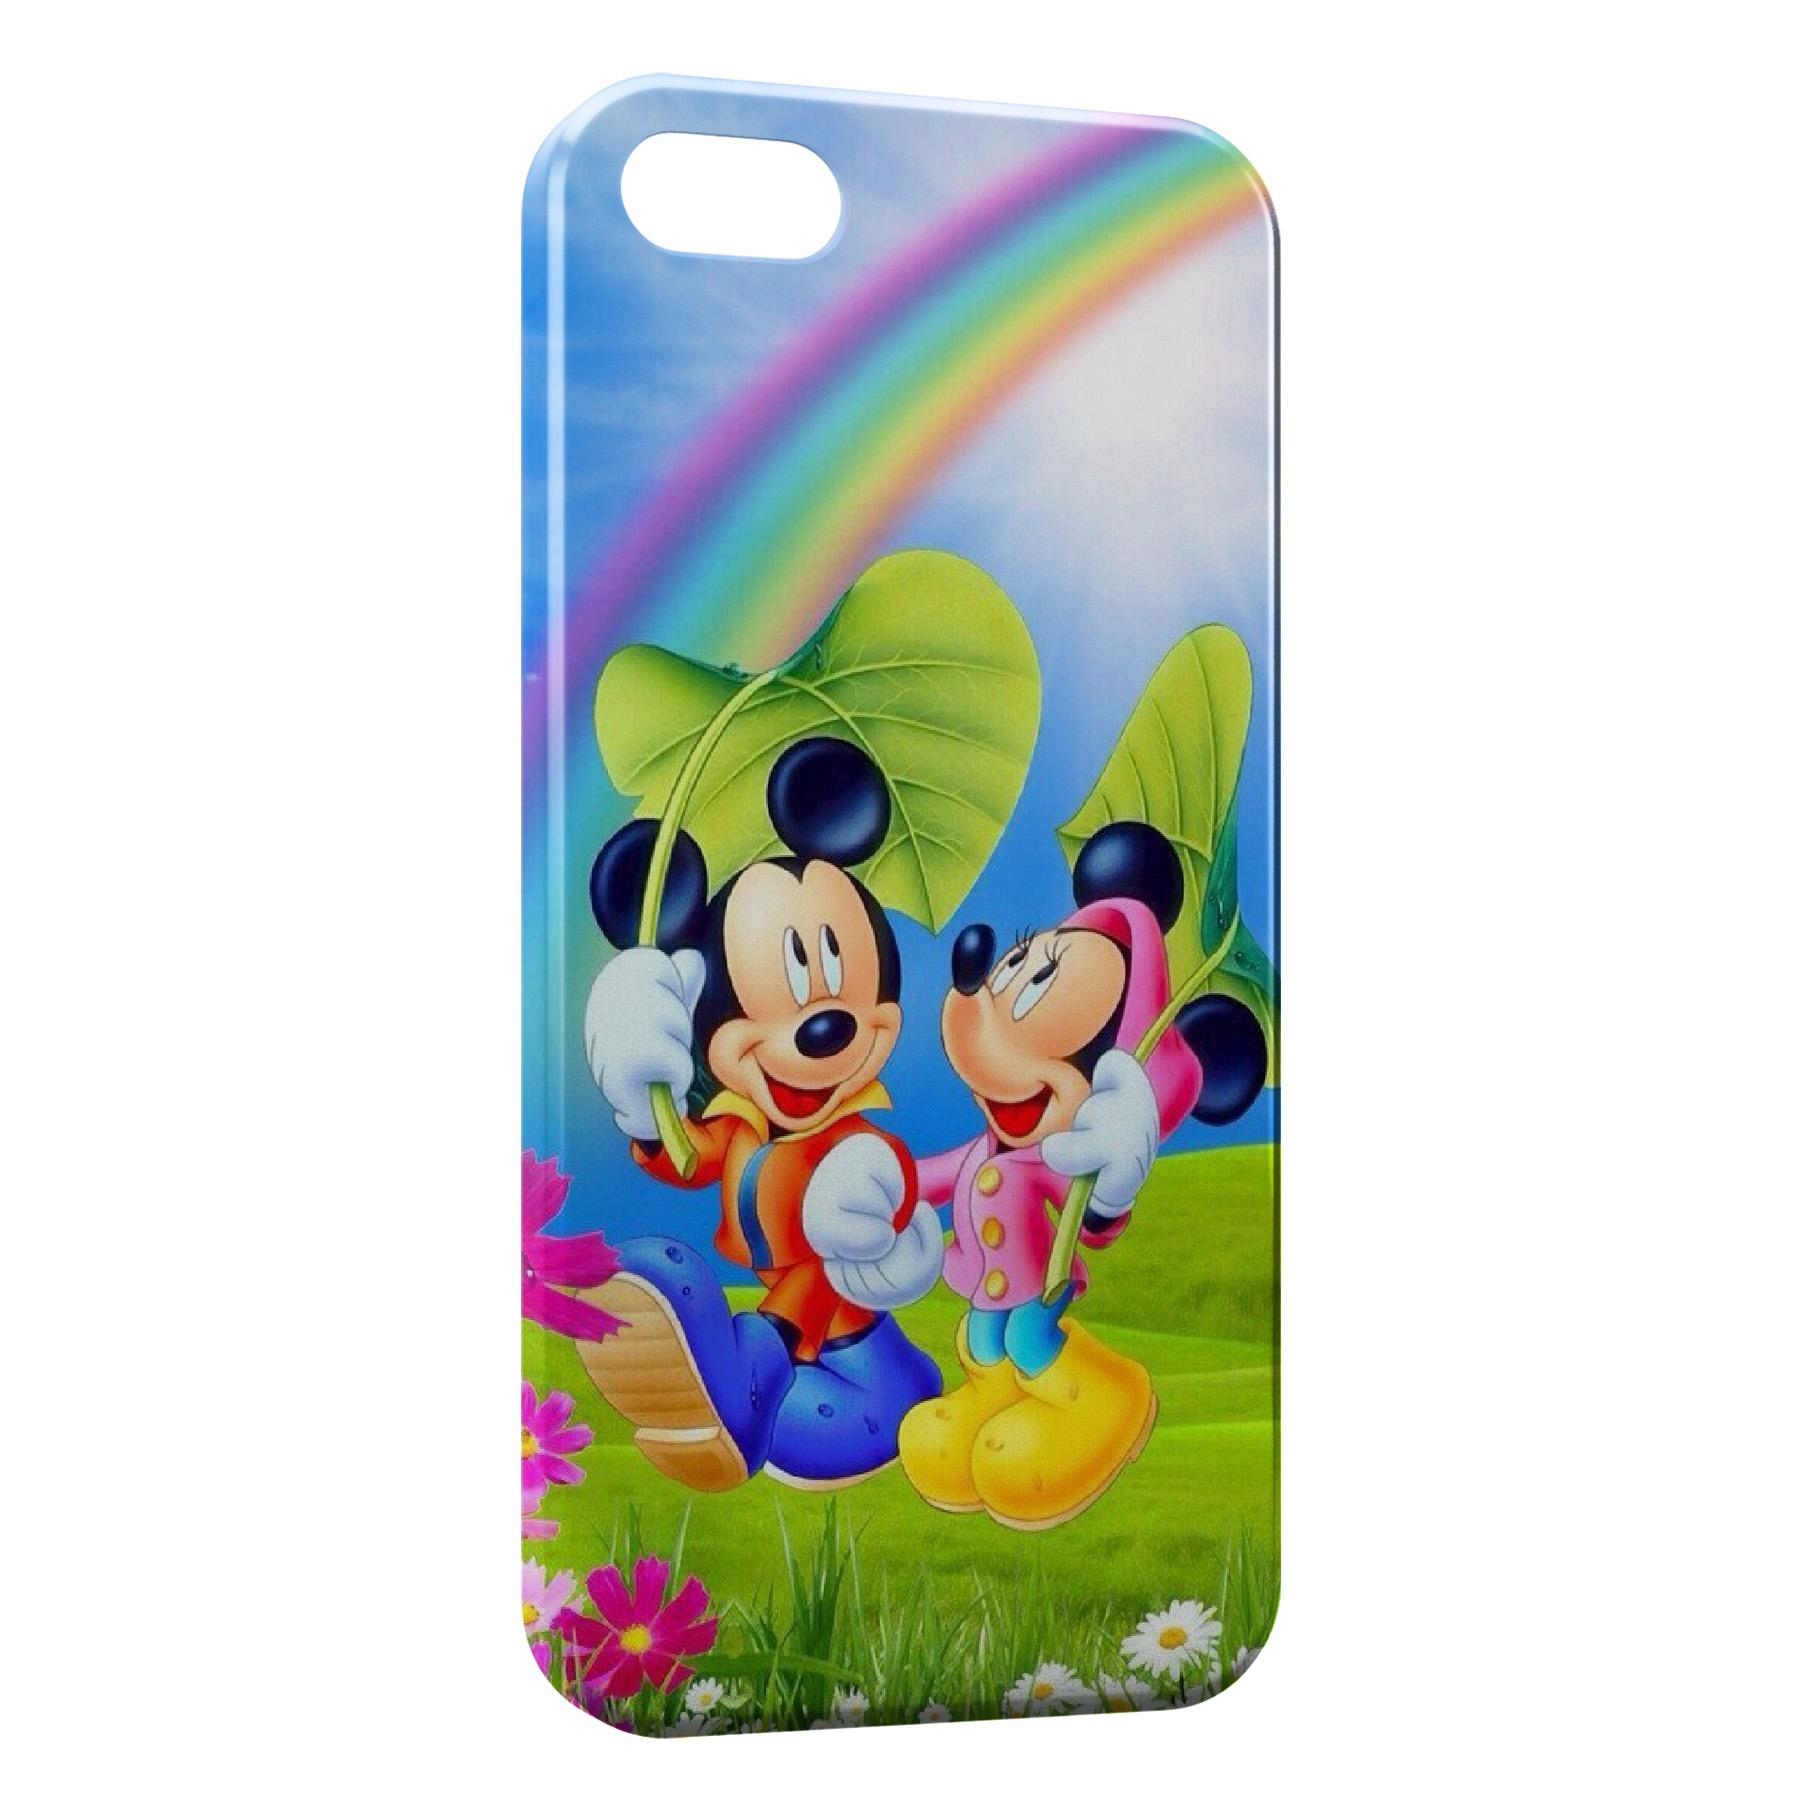 Coque iPhone 6 6S Mickey Minnie 2